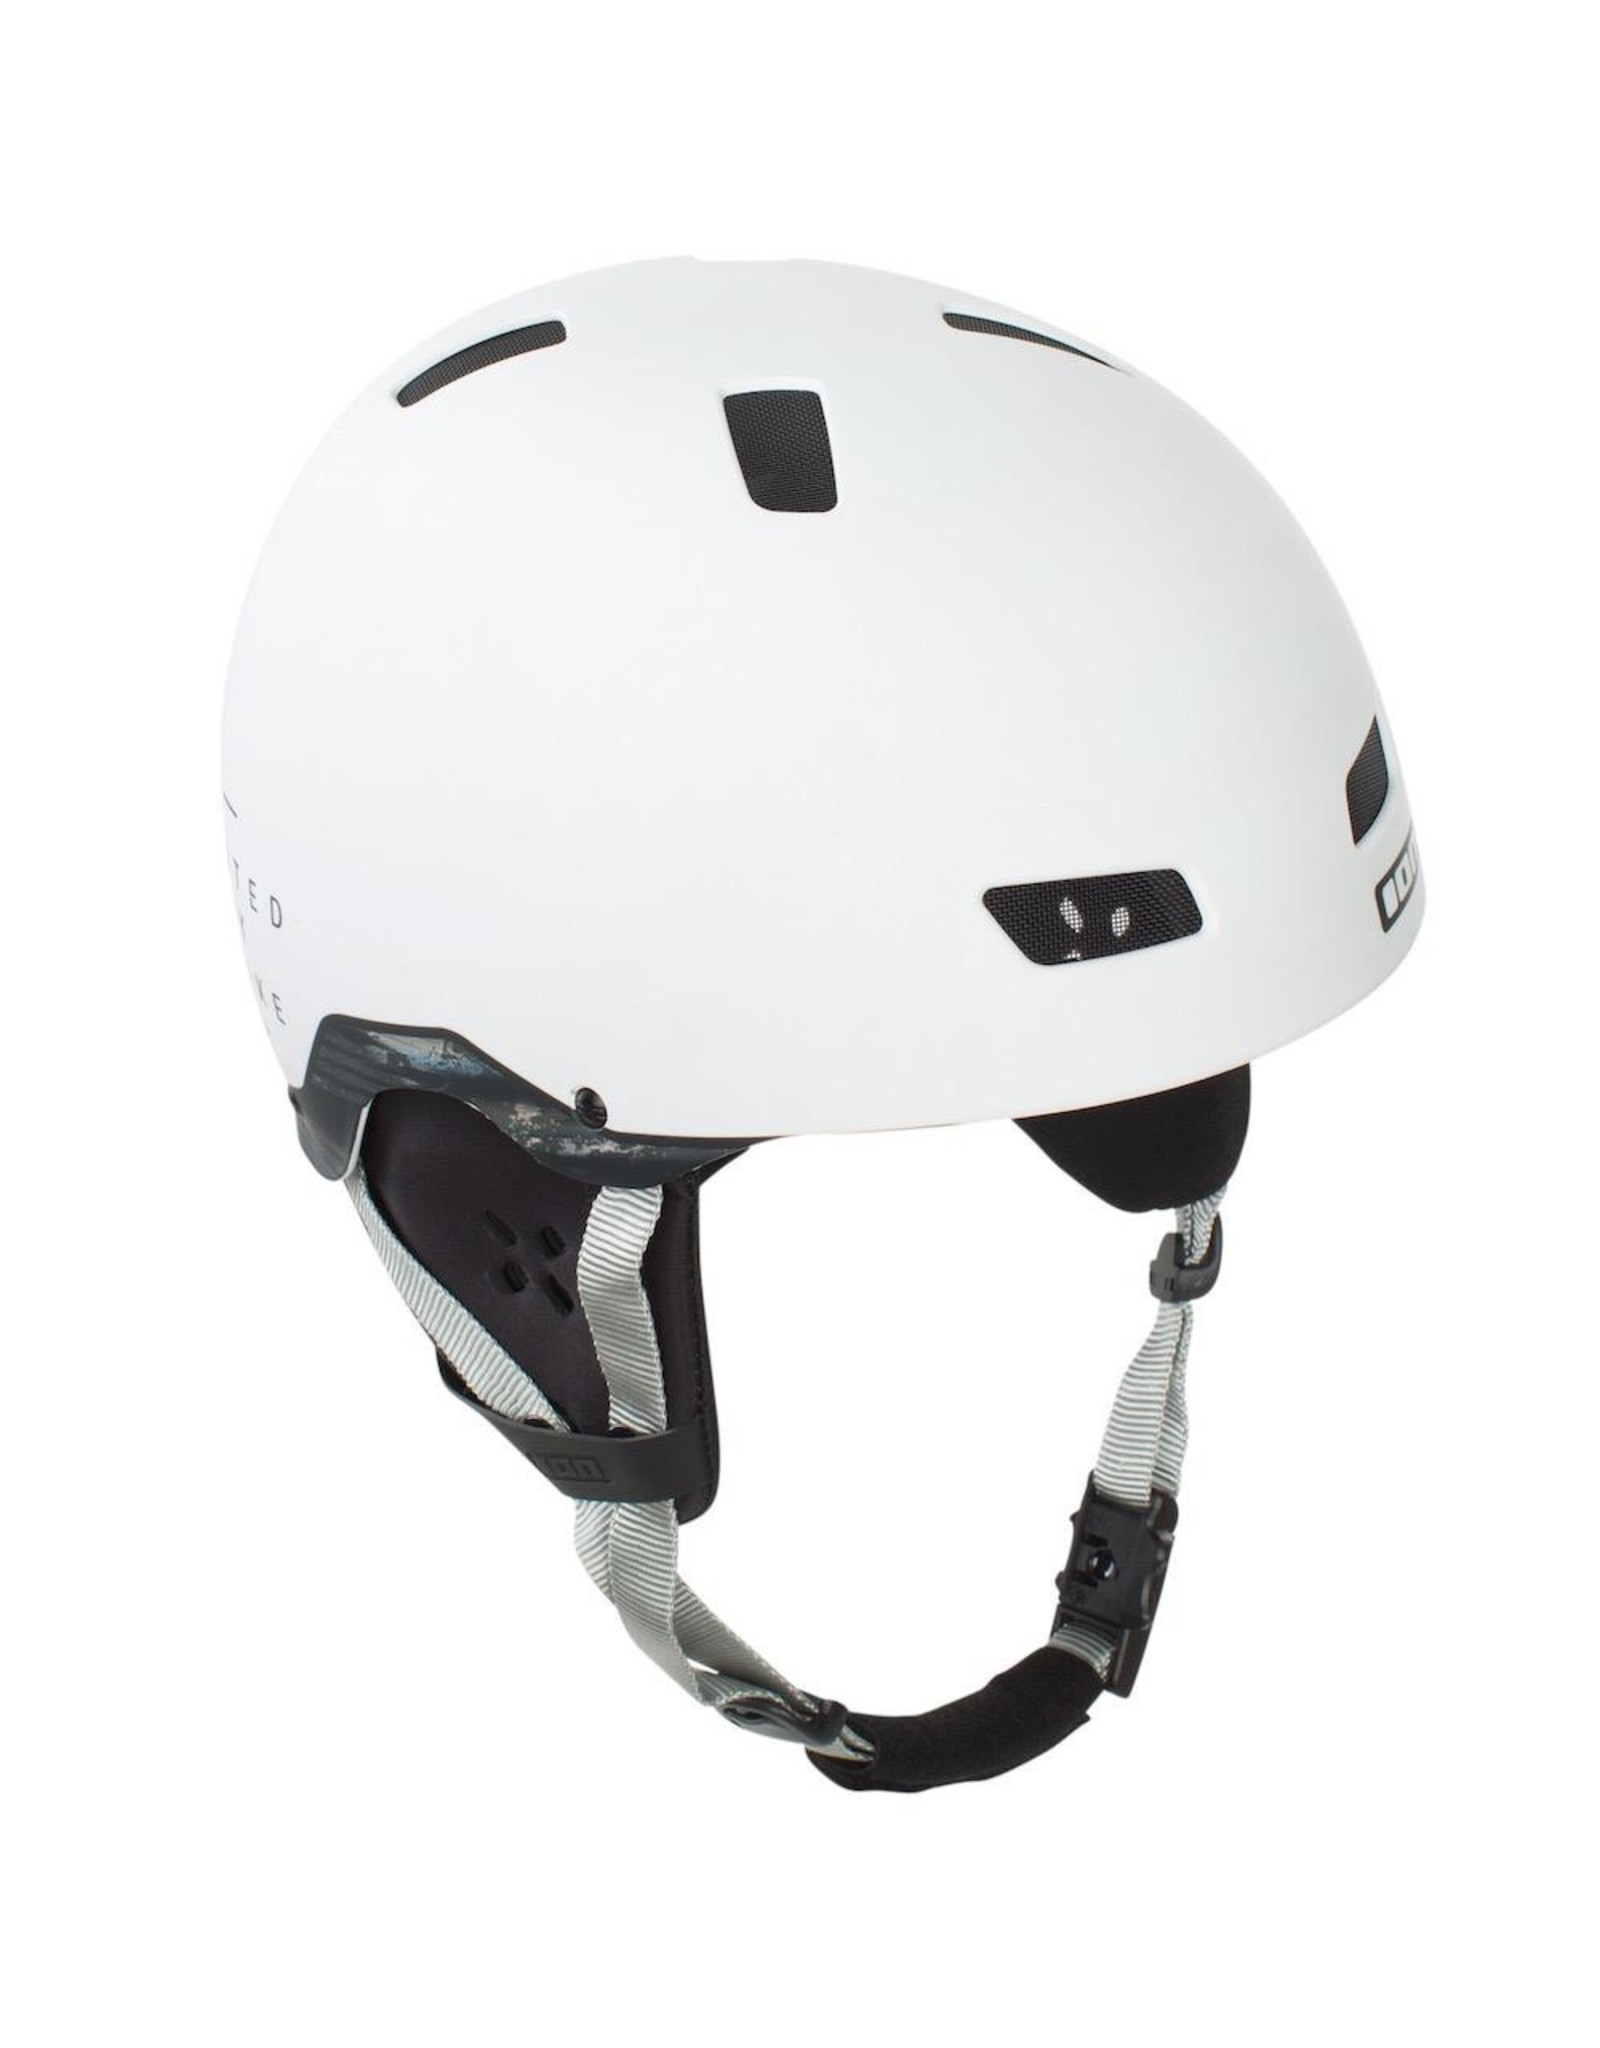 Ion - Hardcap 3.2 select - XL-XXL - White